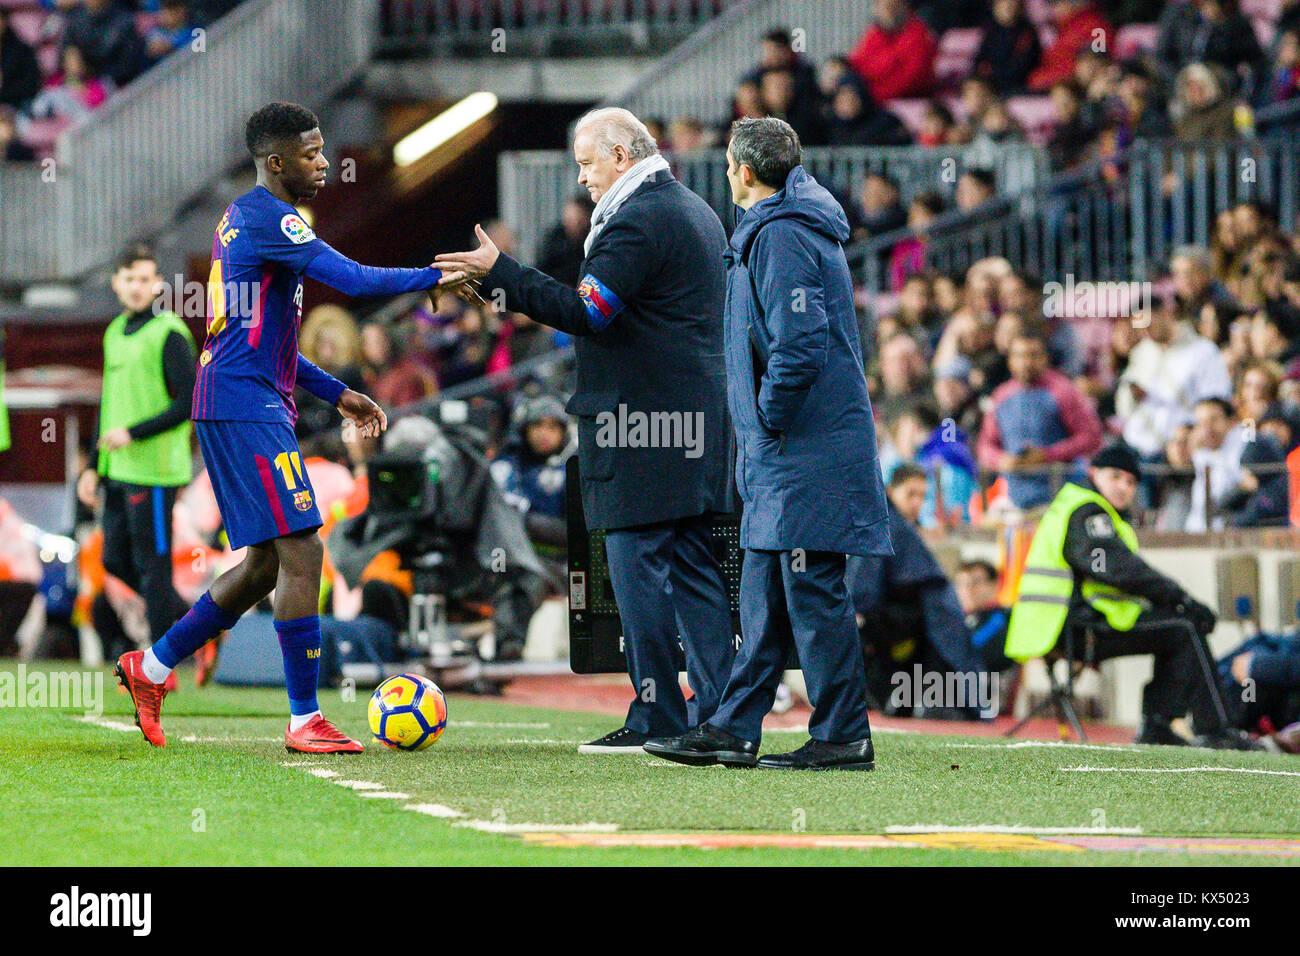 Barcelona, Spain. 07th Jan, 2018. FC Barcelona forward Ousmane Dembele (11) during the match between FC Barcelona - Stock Image